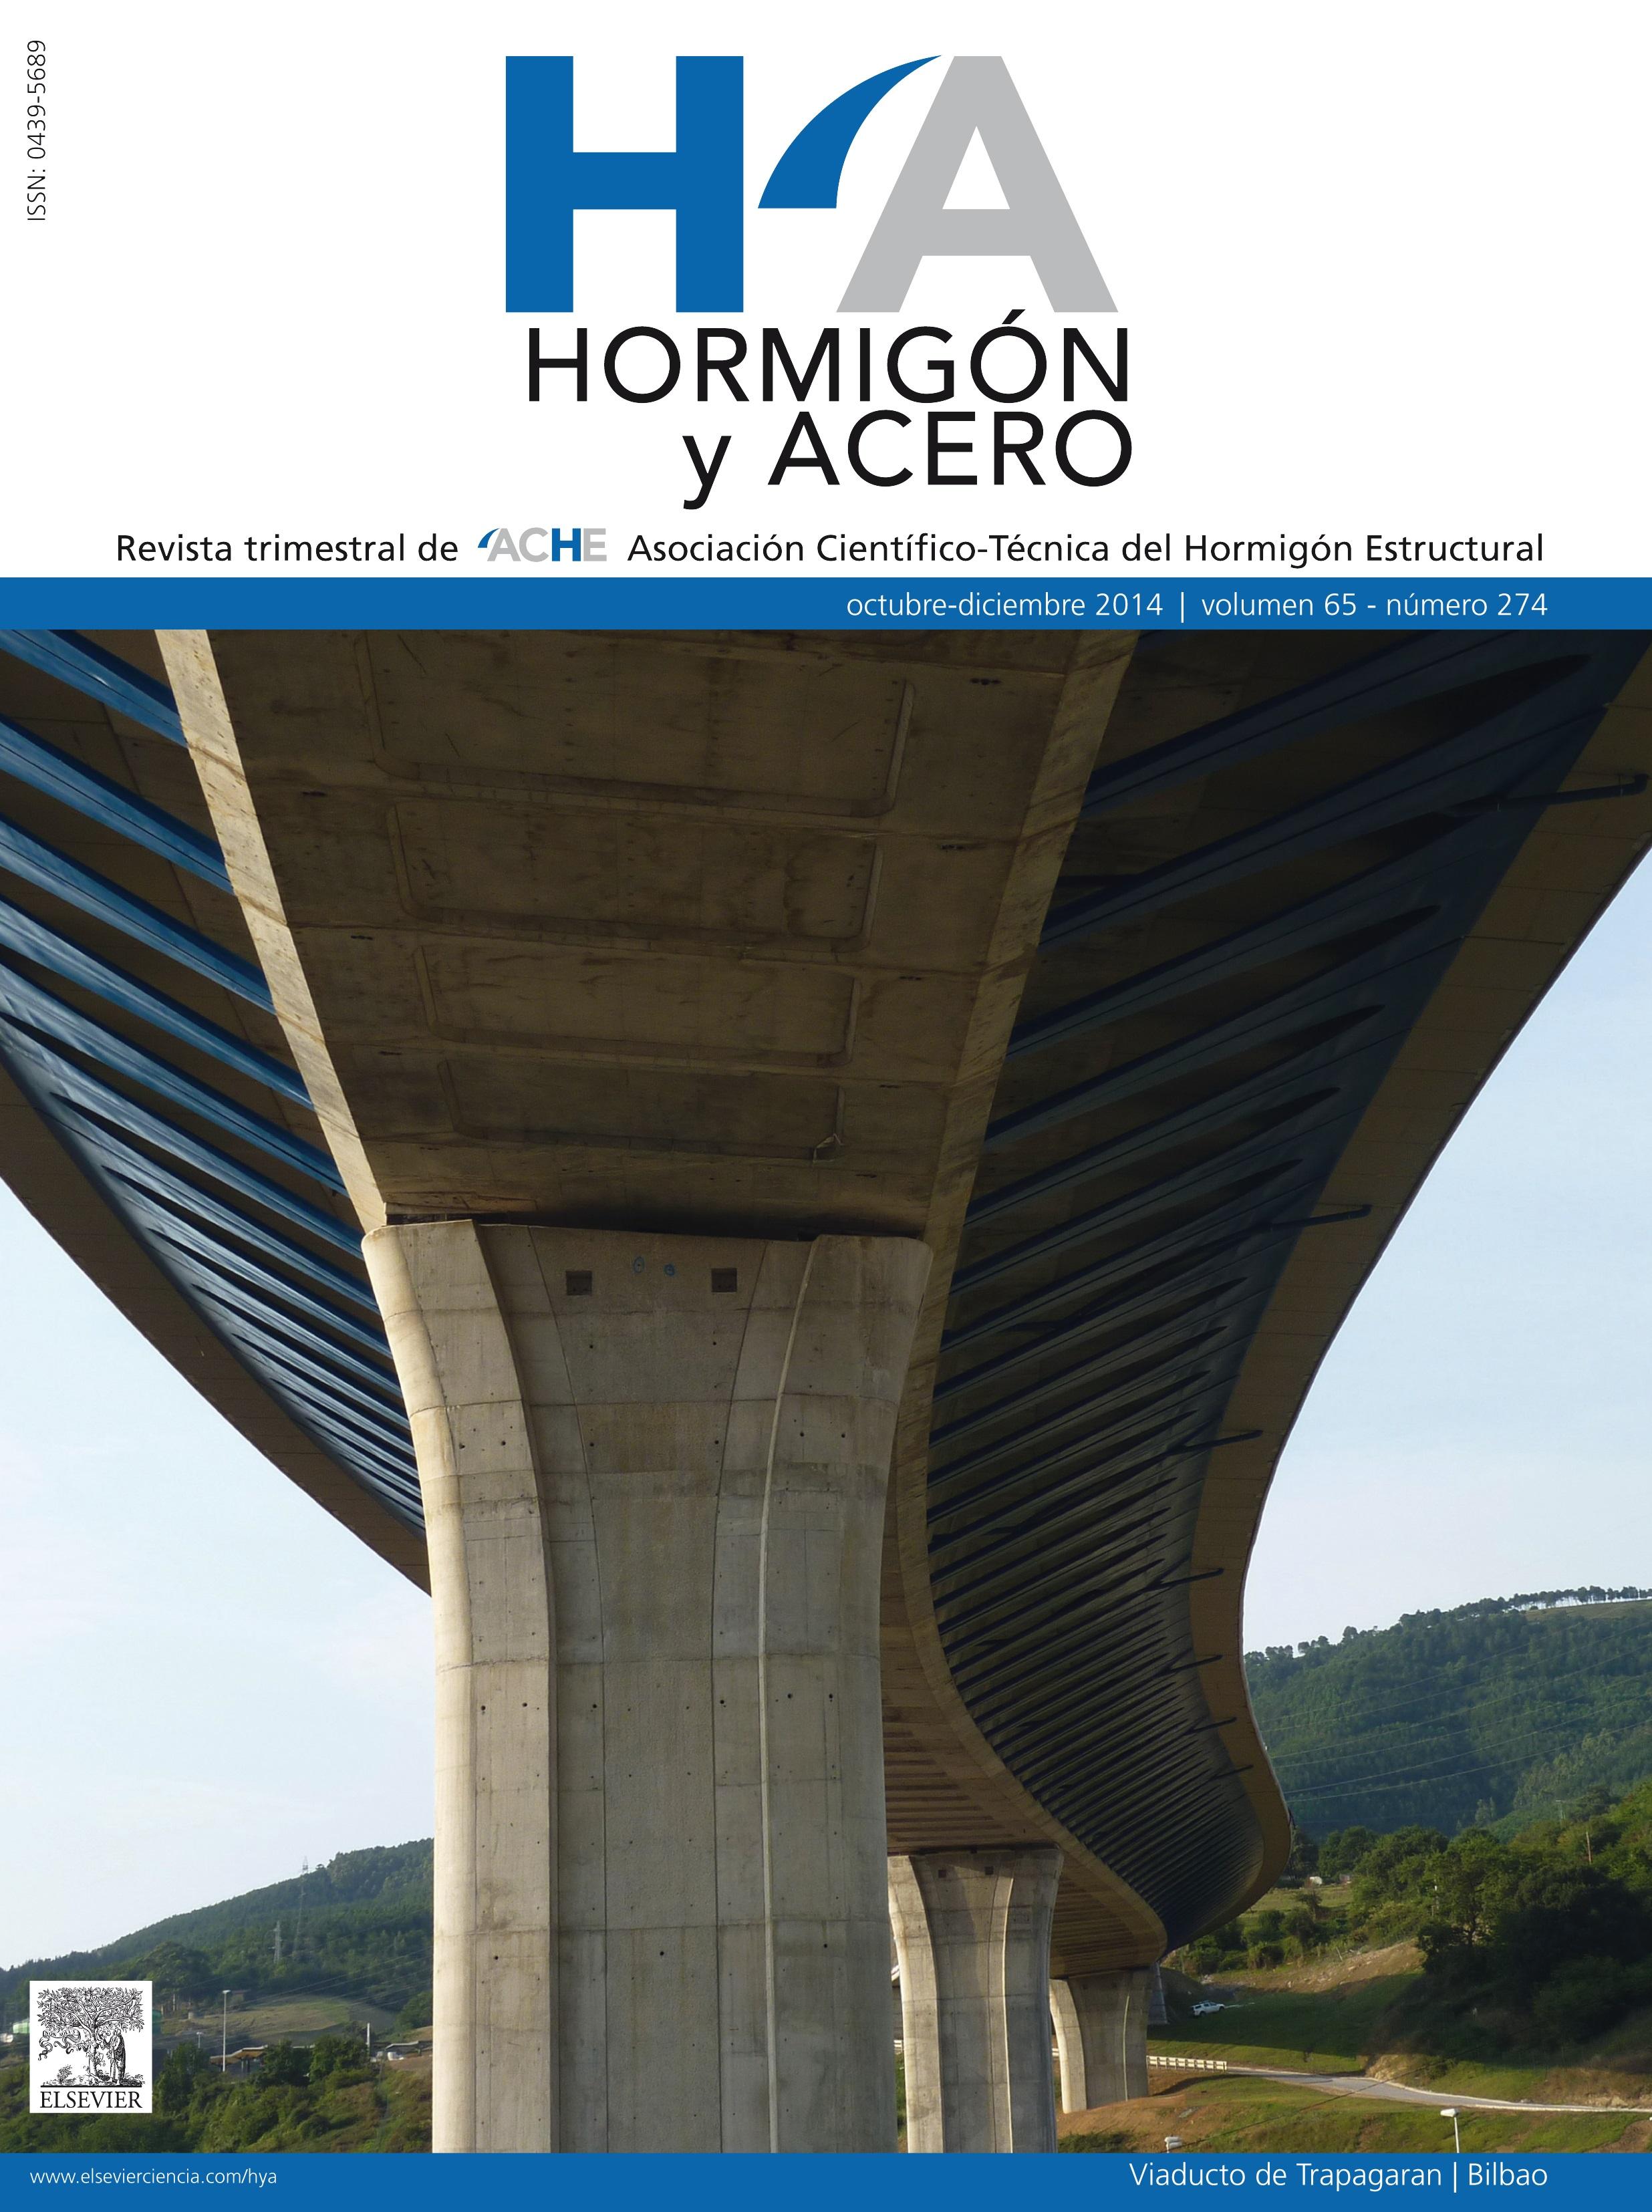 Optimal design of precast fibre reinforced concrete segments